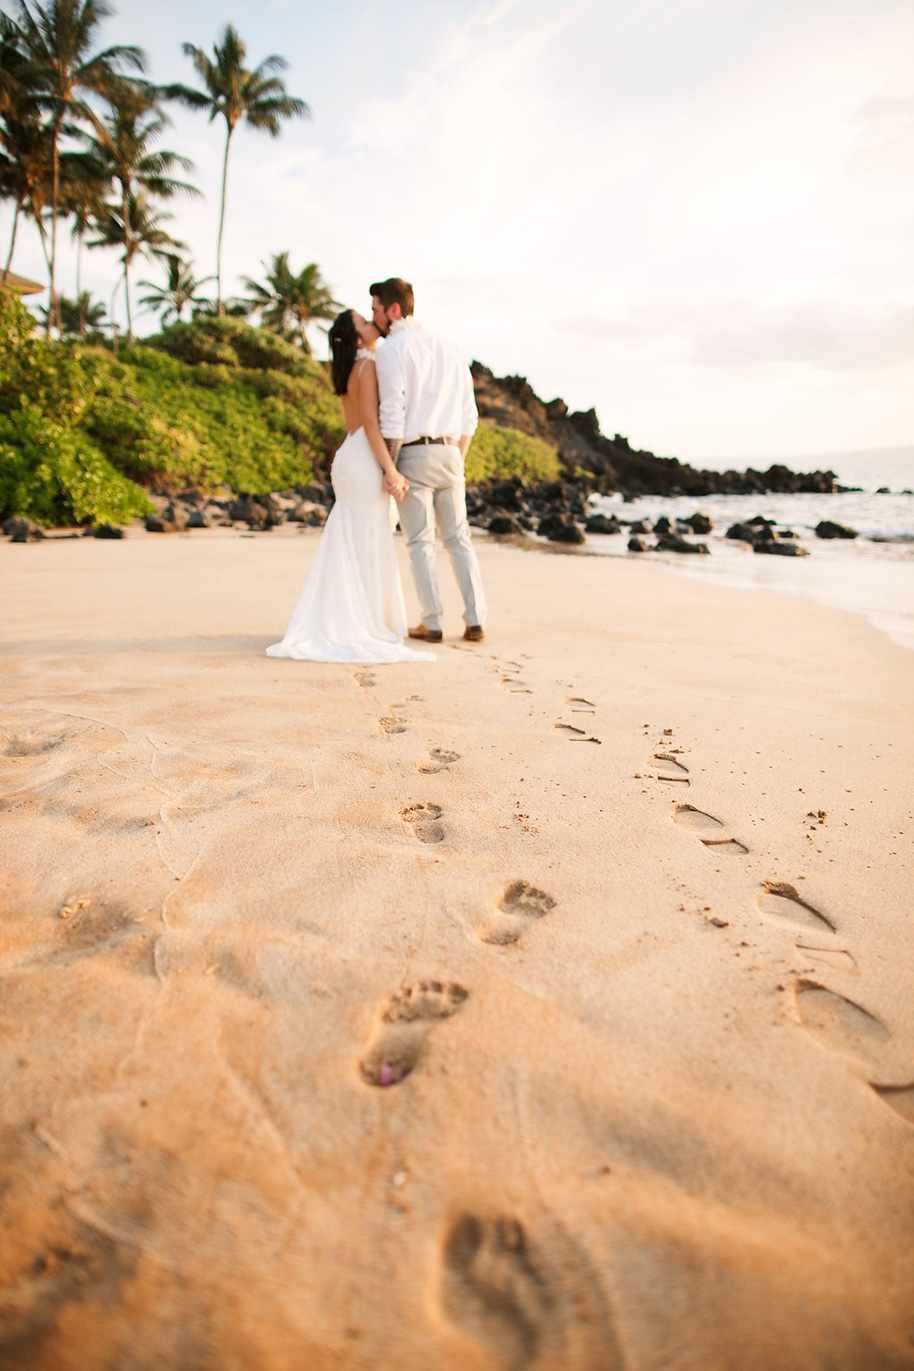 Maui-Beach-Wedding-070616-23